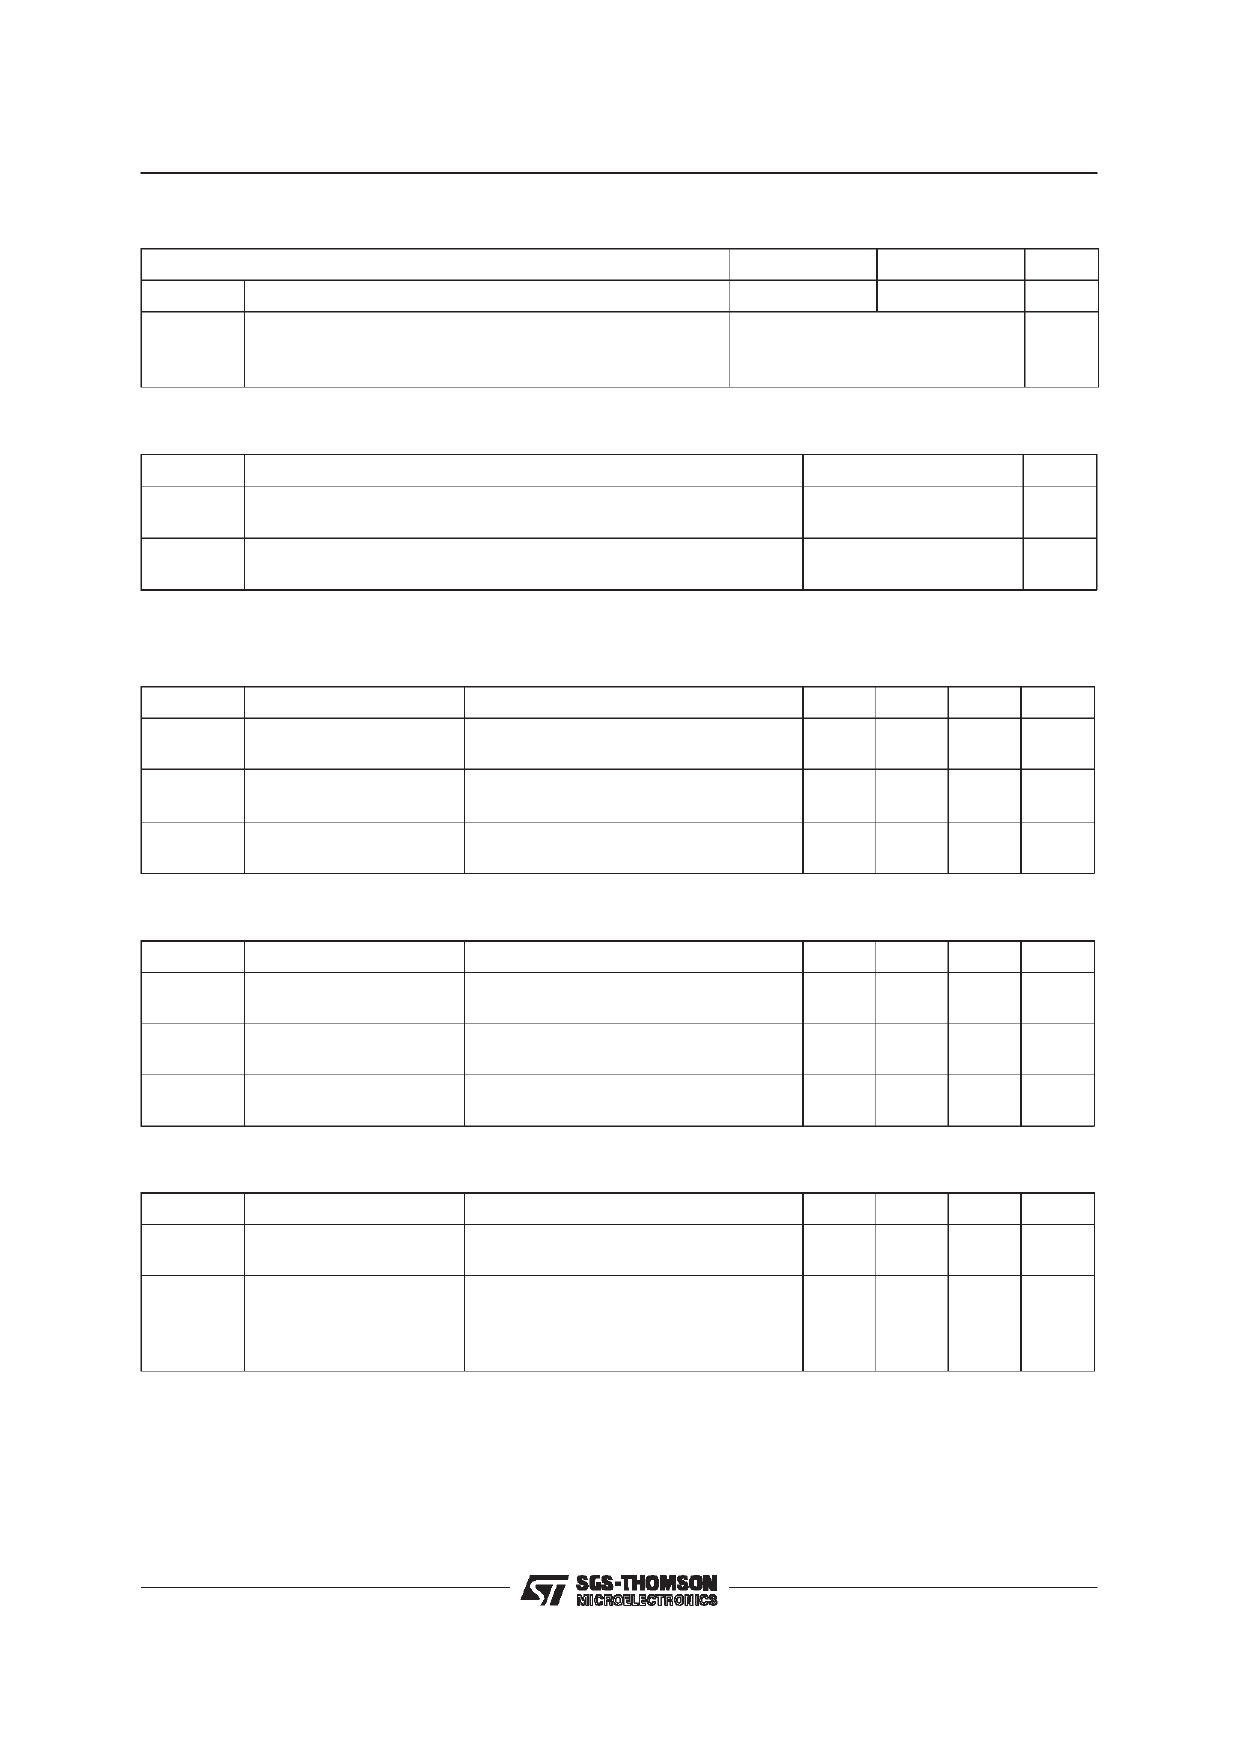 P12NB30 pdf, schematic